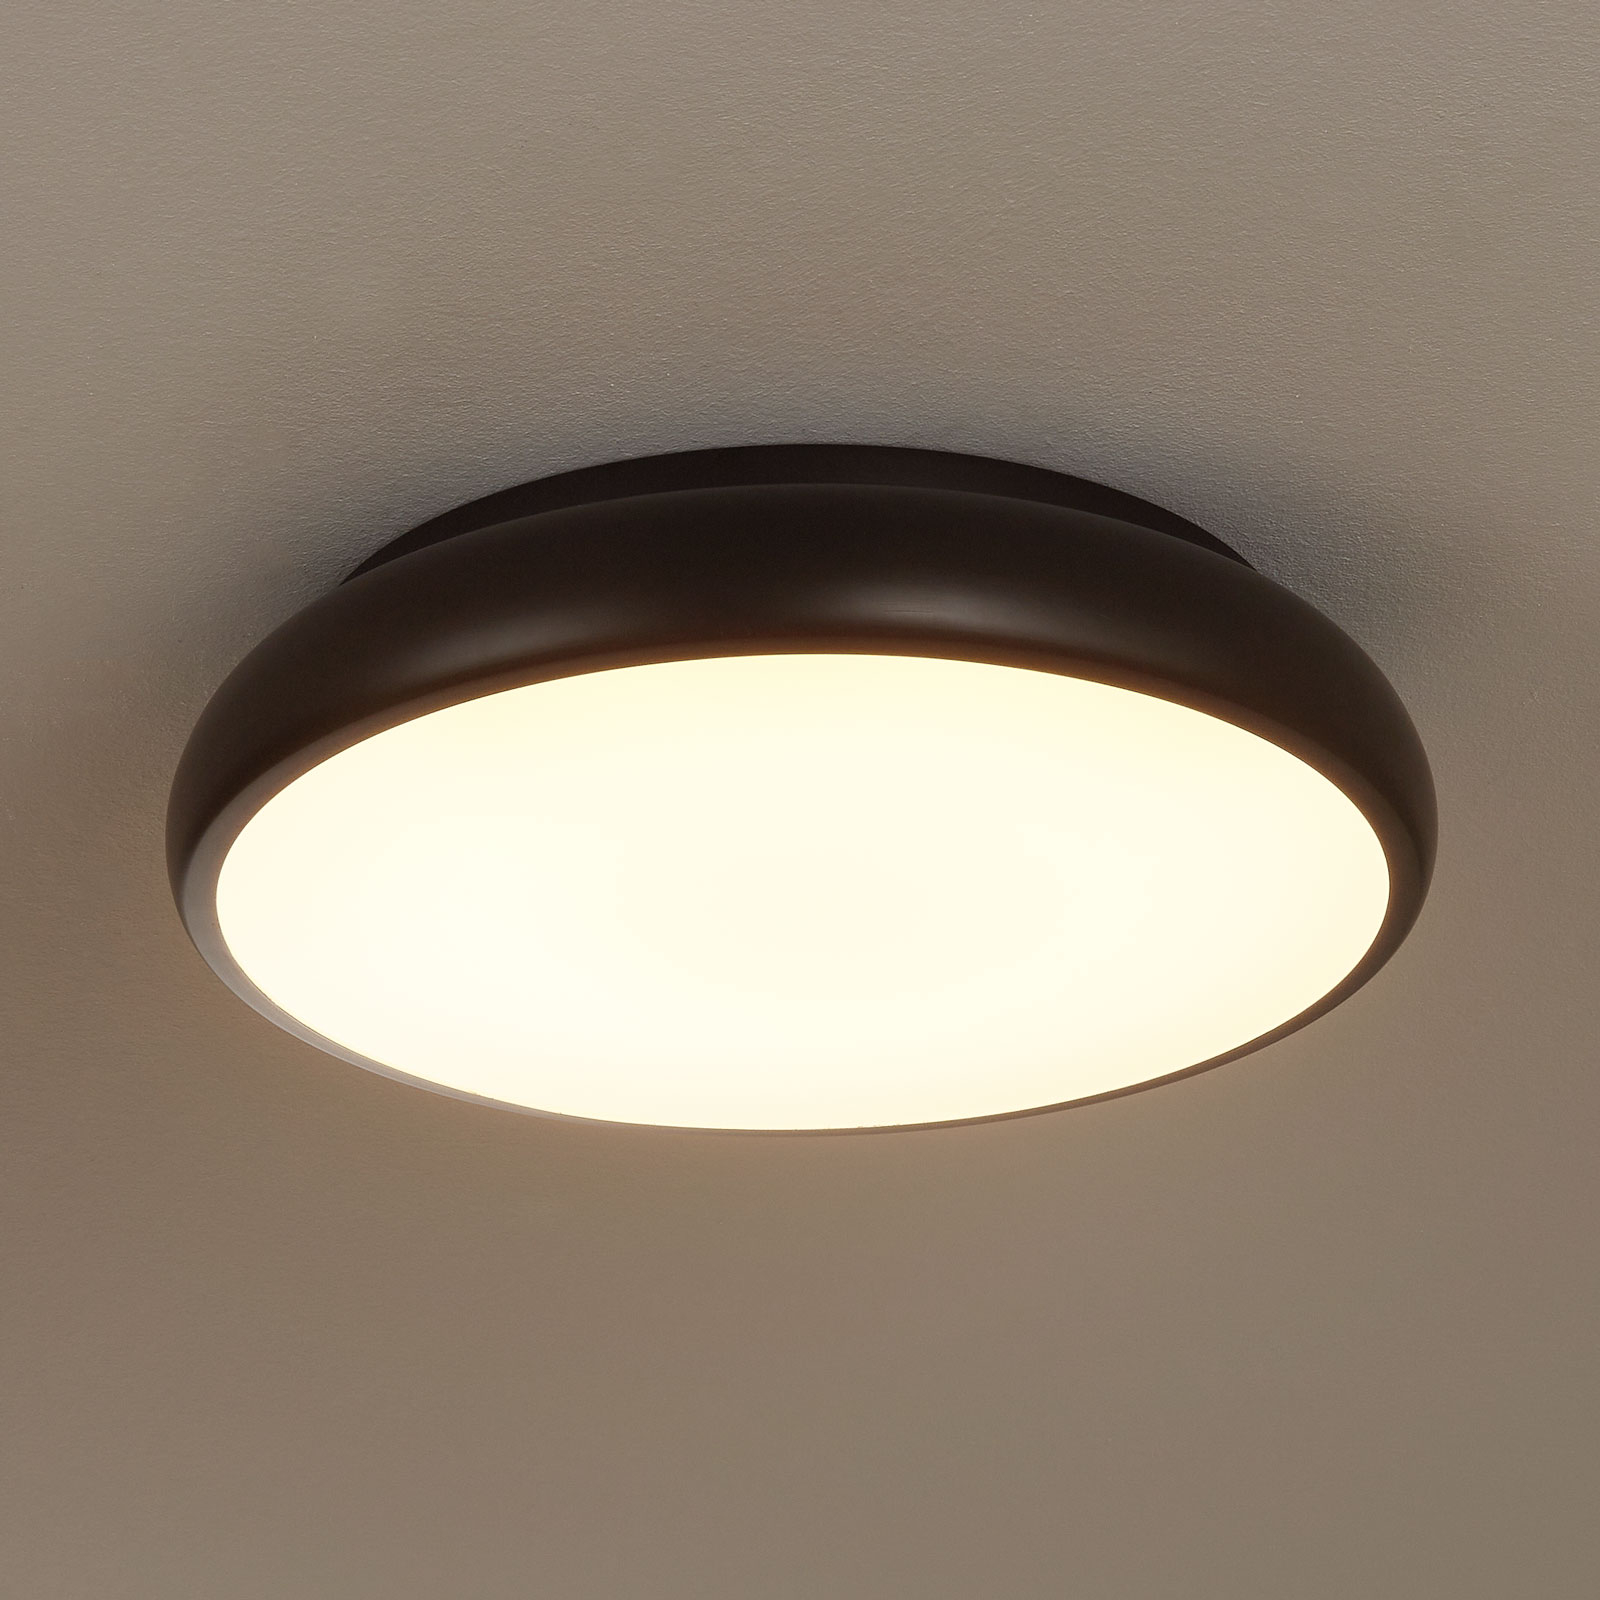 EGLO connect Riodeva-C LED-taklampe svart